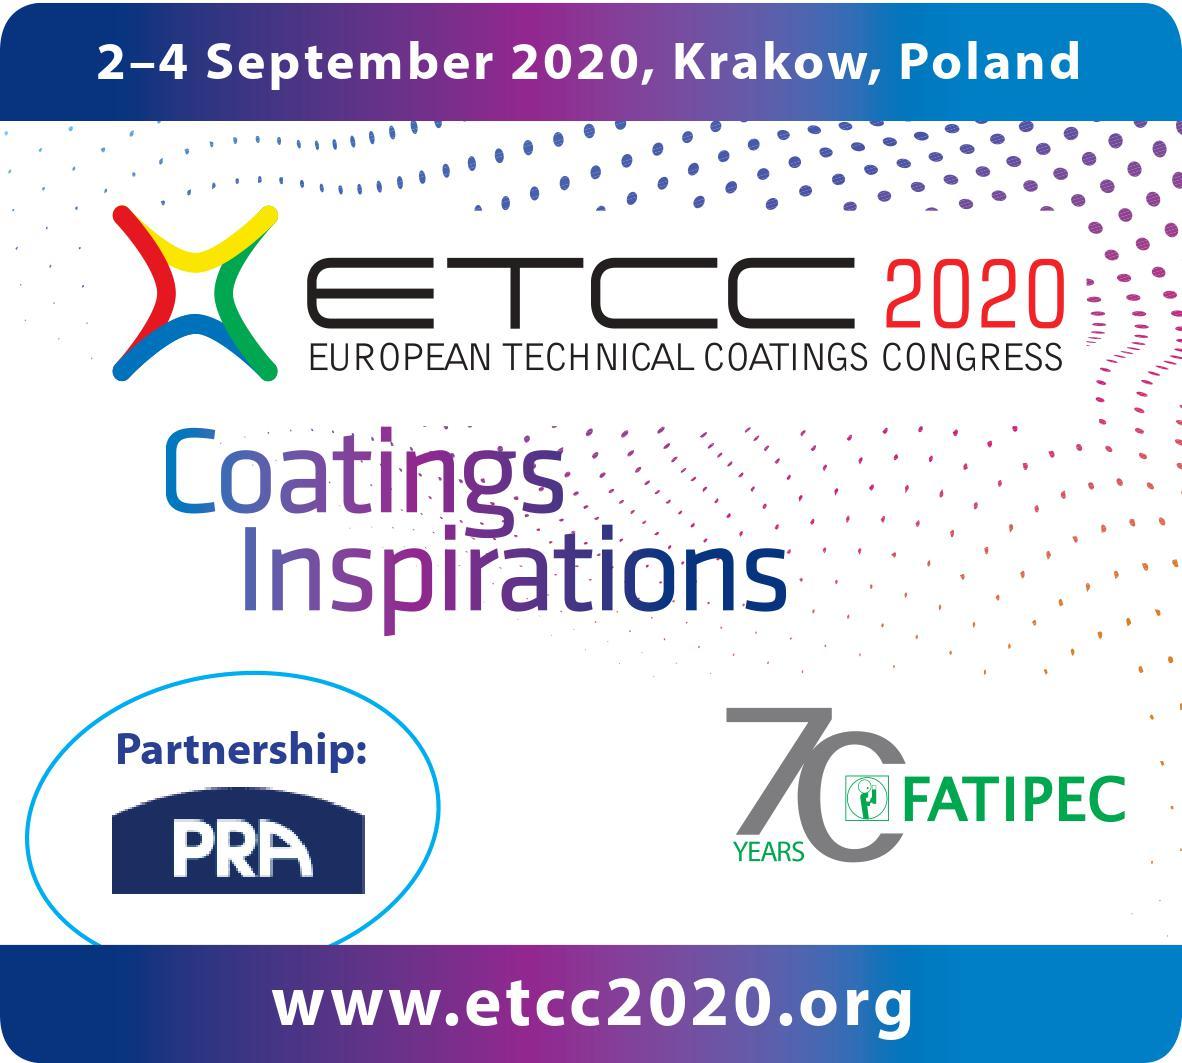 European Technical Coatings Congress 2020